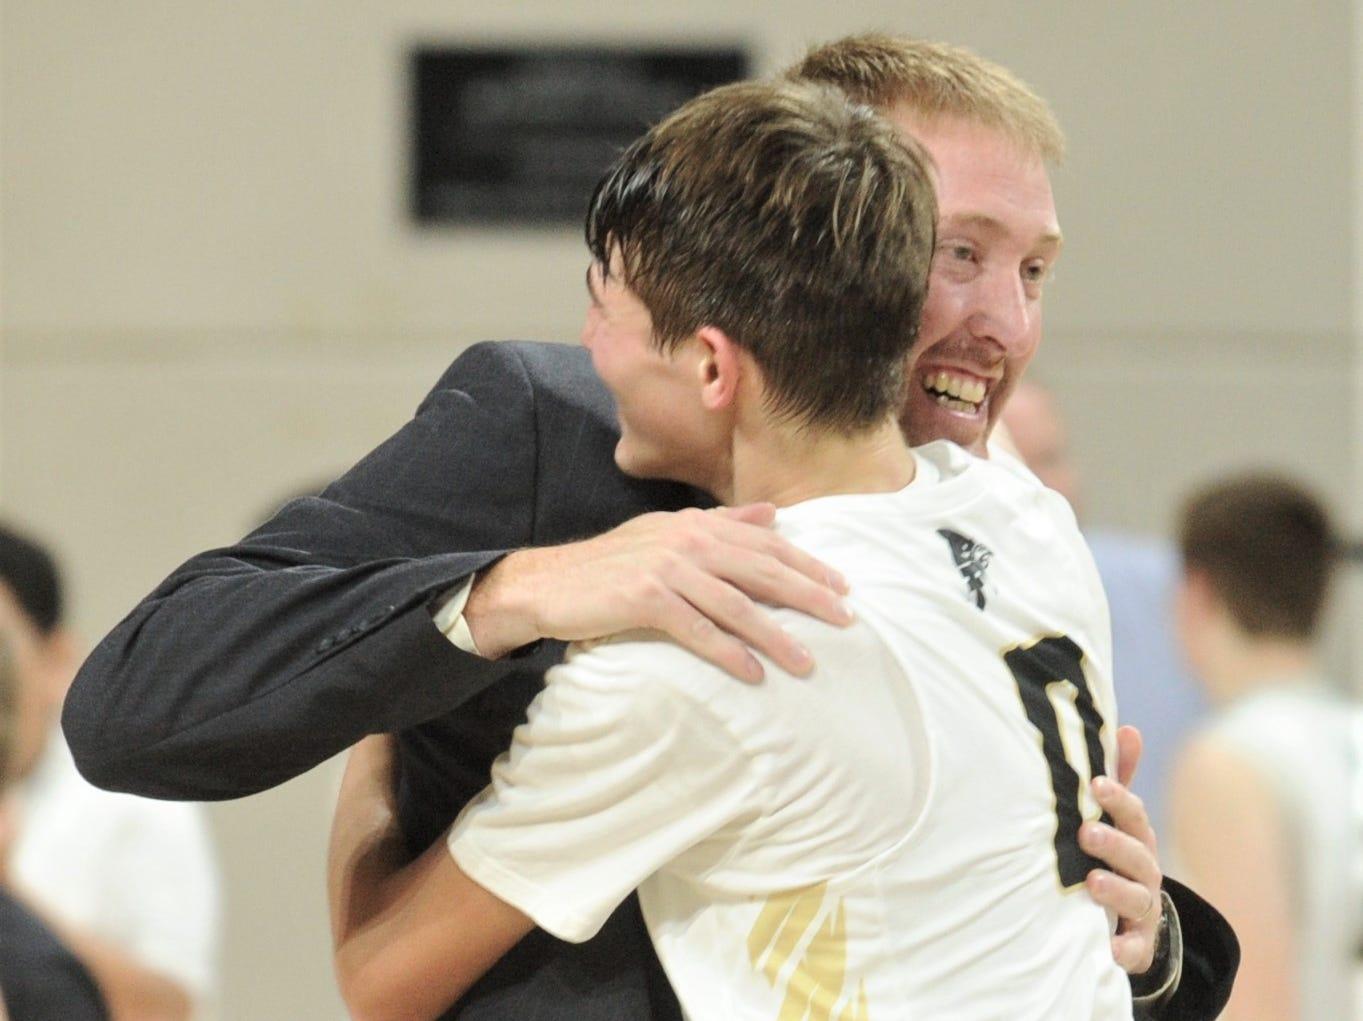 Jayton coach Ryan Bleiker hugs Tripp Scott after the Jaybirds beat Irion County 47-32 for the Region II-1A title on Saturday, March 2, 2019, at Abilene Christian's Moody Coliseum.